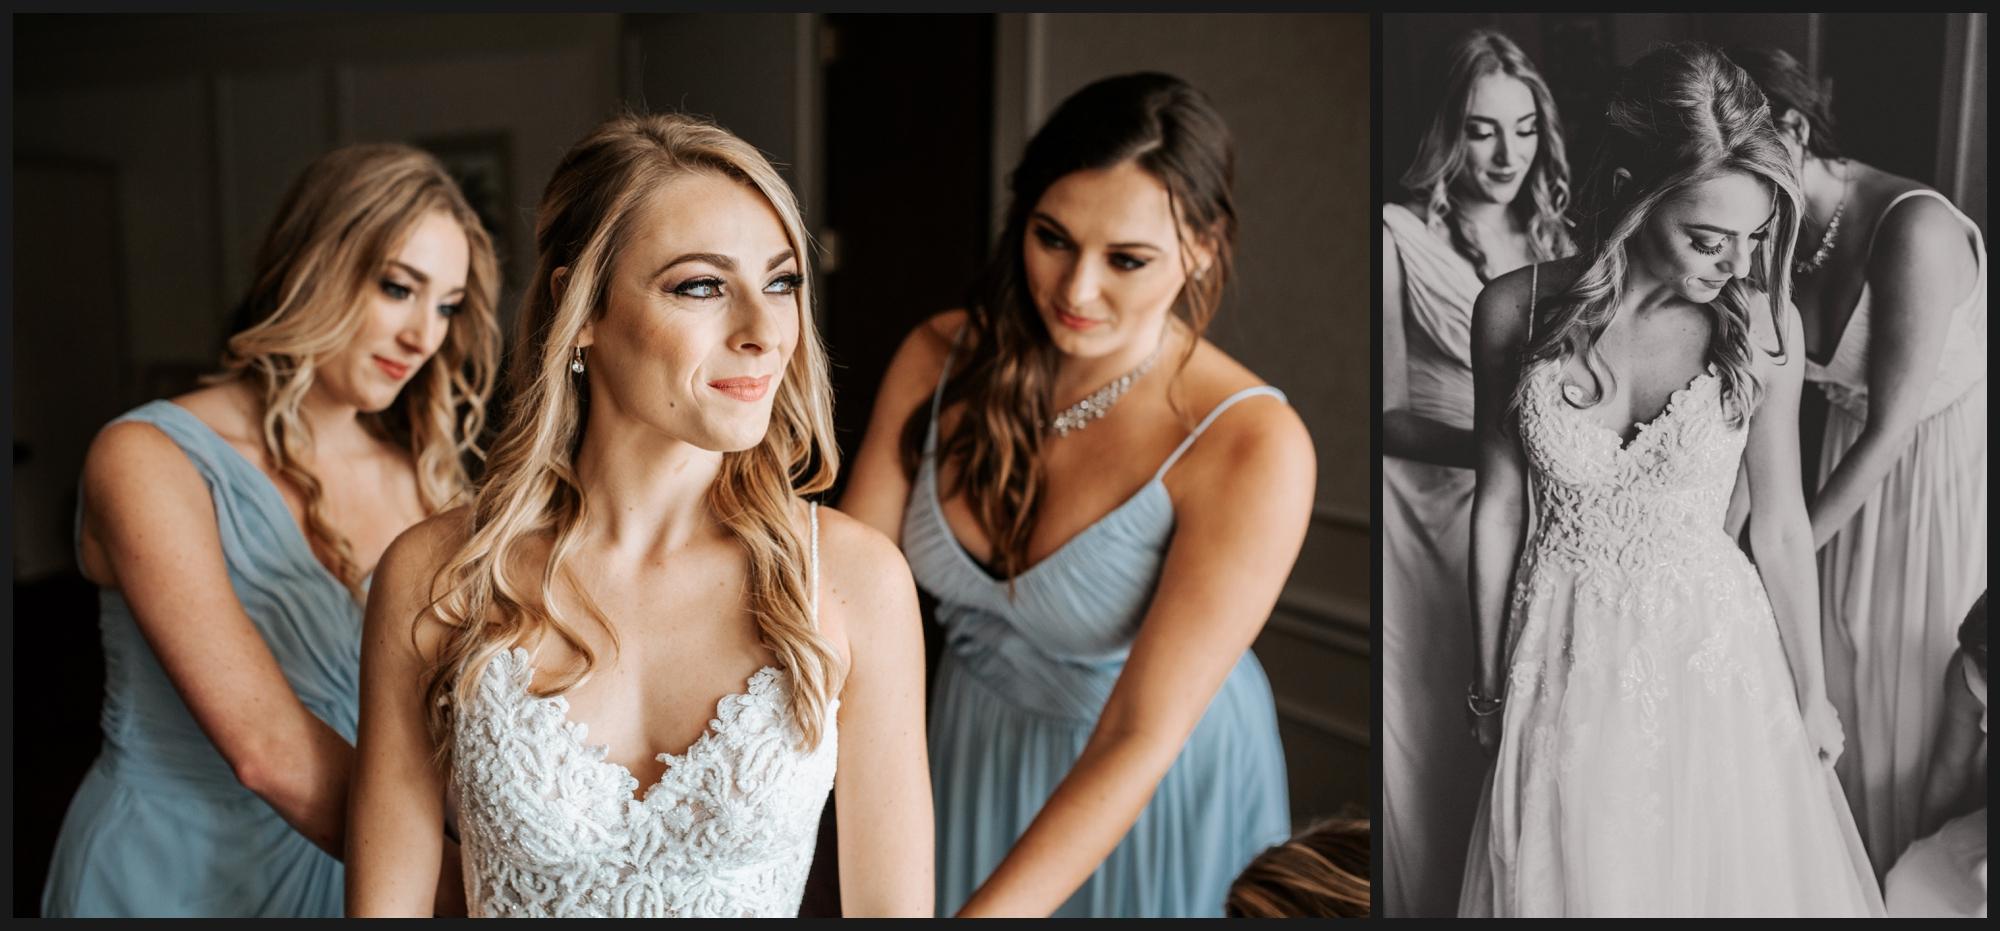 Orlando-Wedding-Photographer-destination-wedding-photographer-florida-wedding-photographer-bohemian-wedding-photographer_0006.jpg